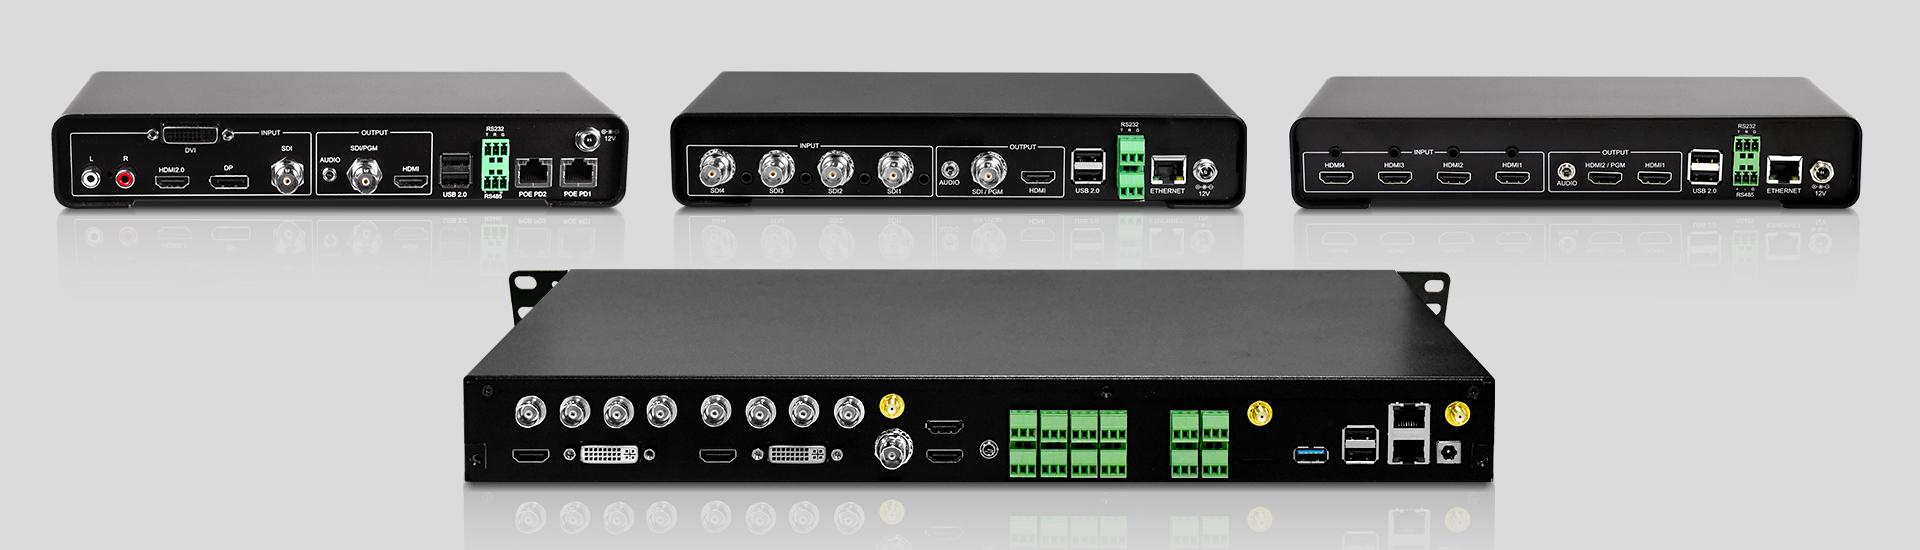 4K Streaming Server